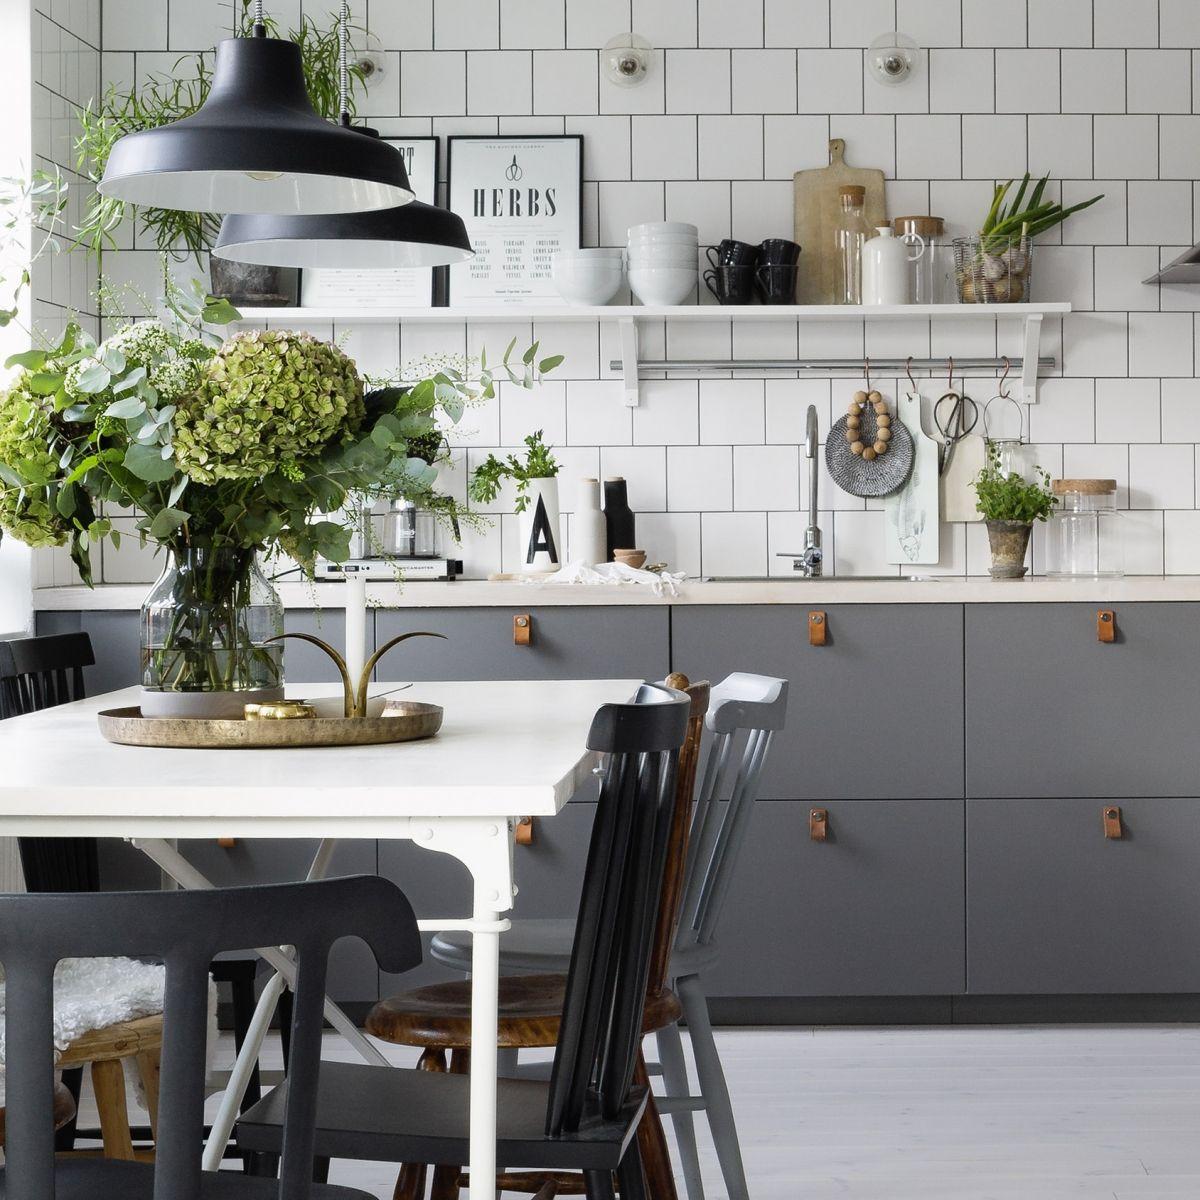 Läderbeslag på kökslucka | Interior/Exterior | Pinterest | Küche und ...